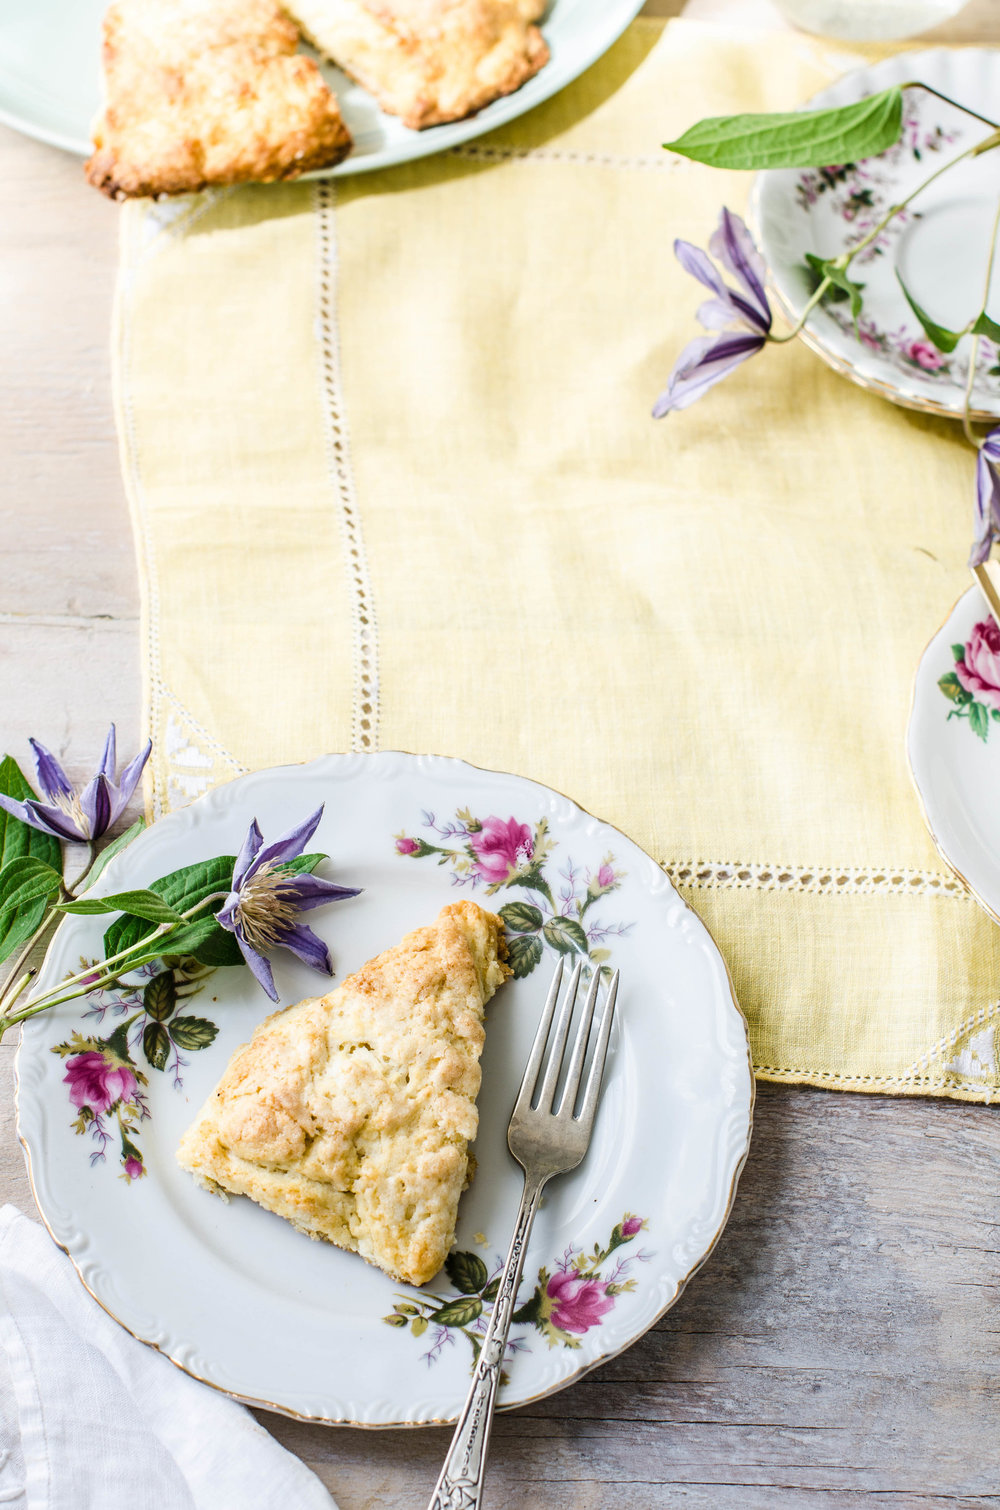 rose+&+ivy+journal+sugared+lemon+scones.jpeg